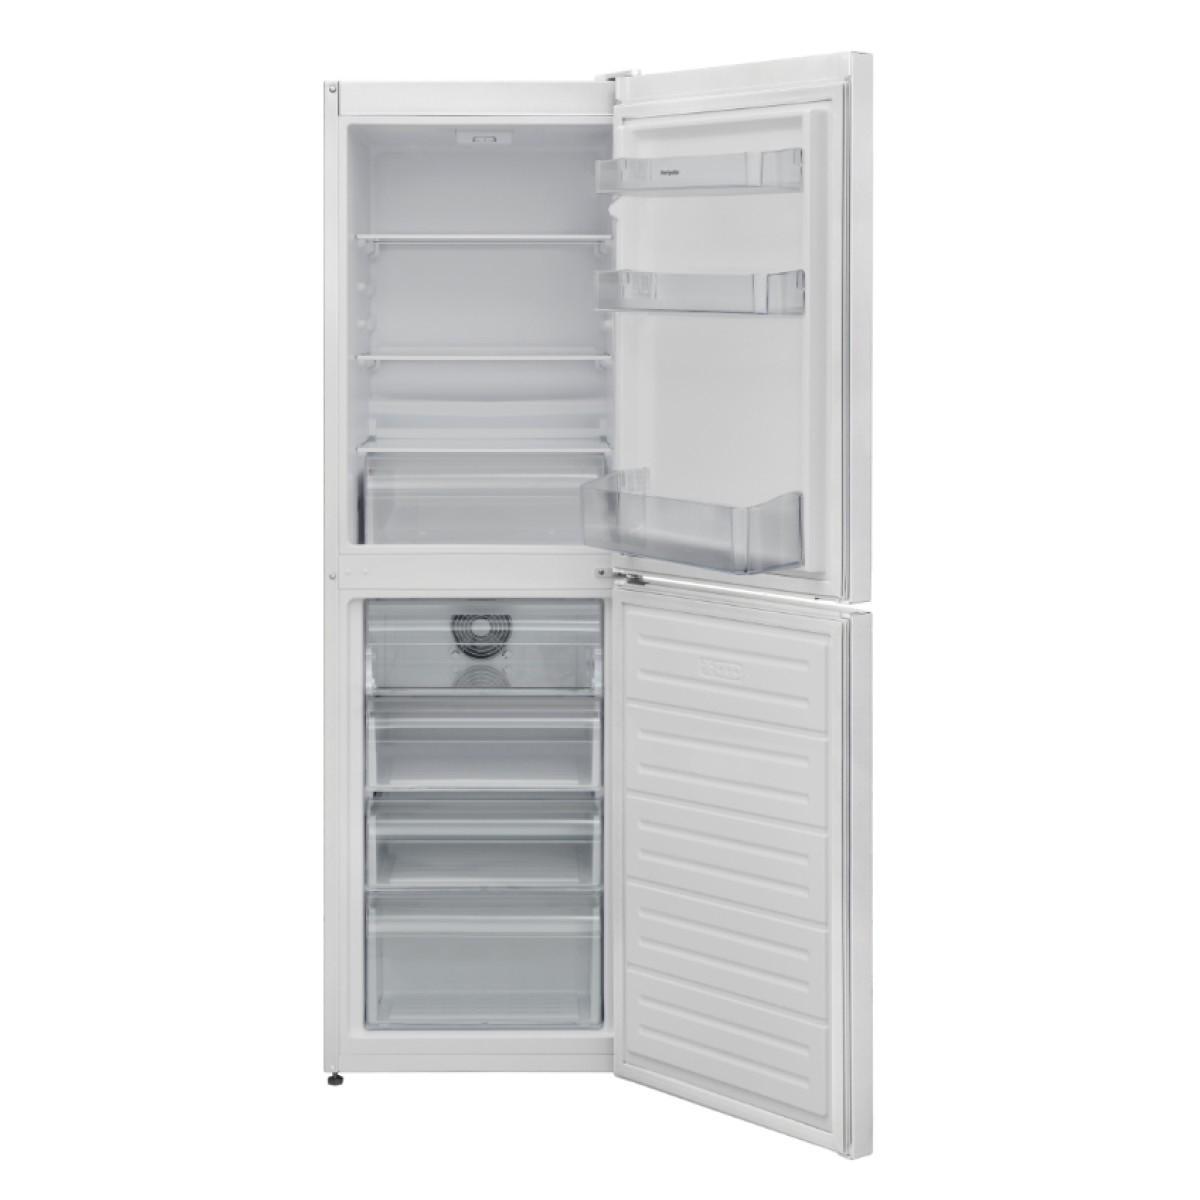 Montpellier MFF165W Fridge Freezer